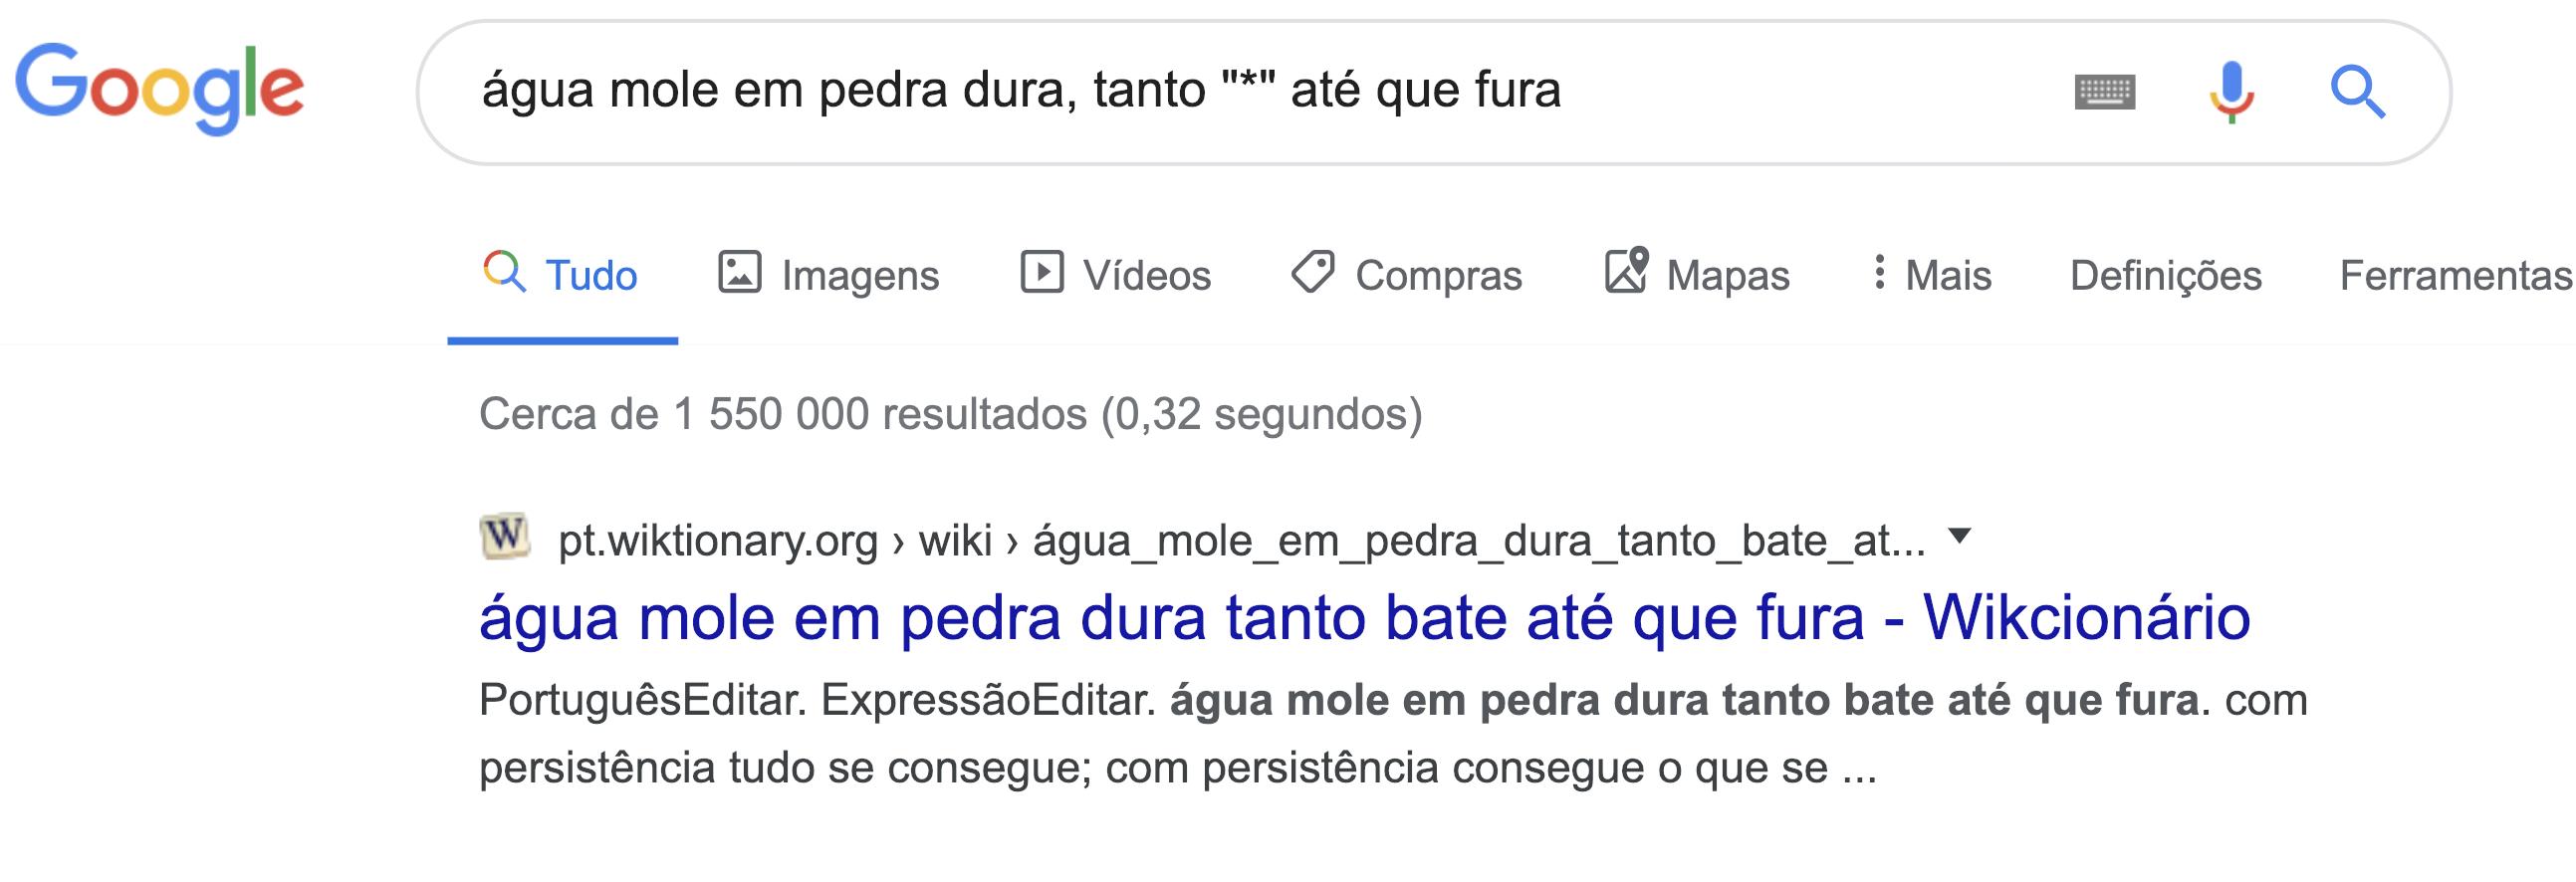 pesquisa-google-palavras-perdidas